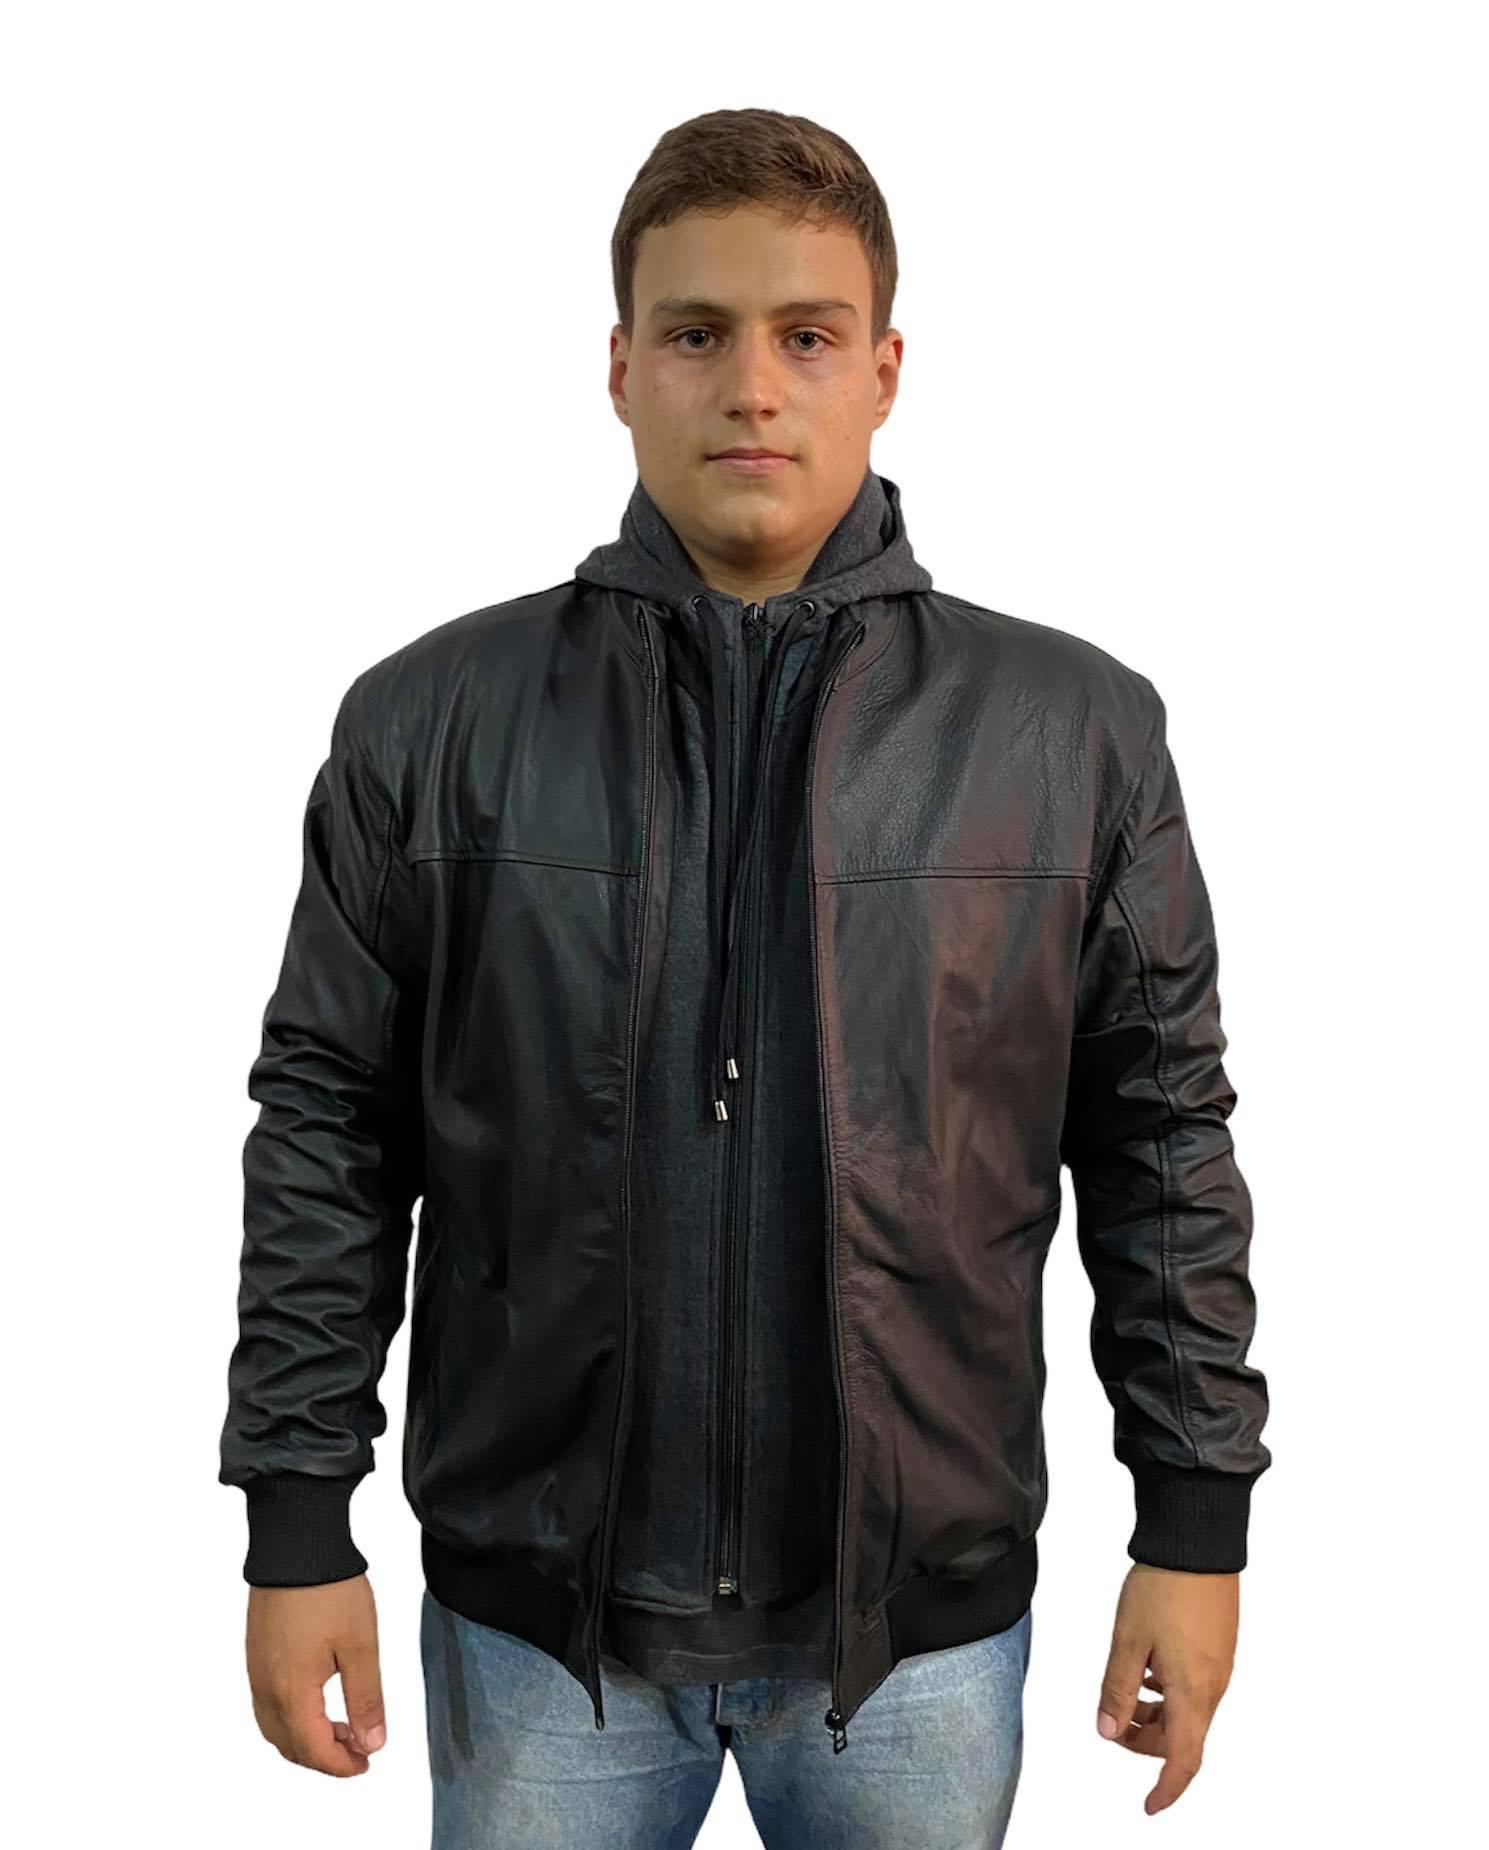 Jaqueta Masculina Prata Couro VEST 775 Preta com Capuz Plus Size